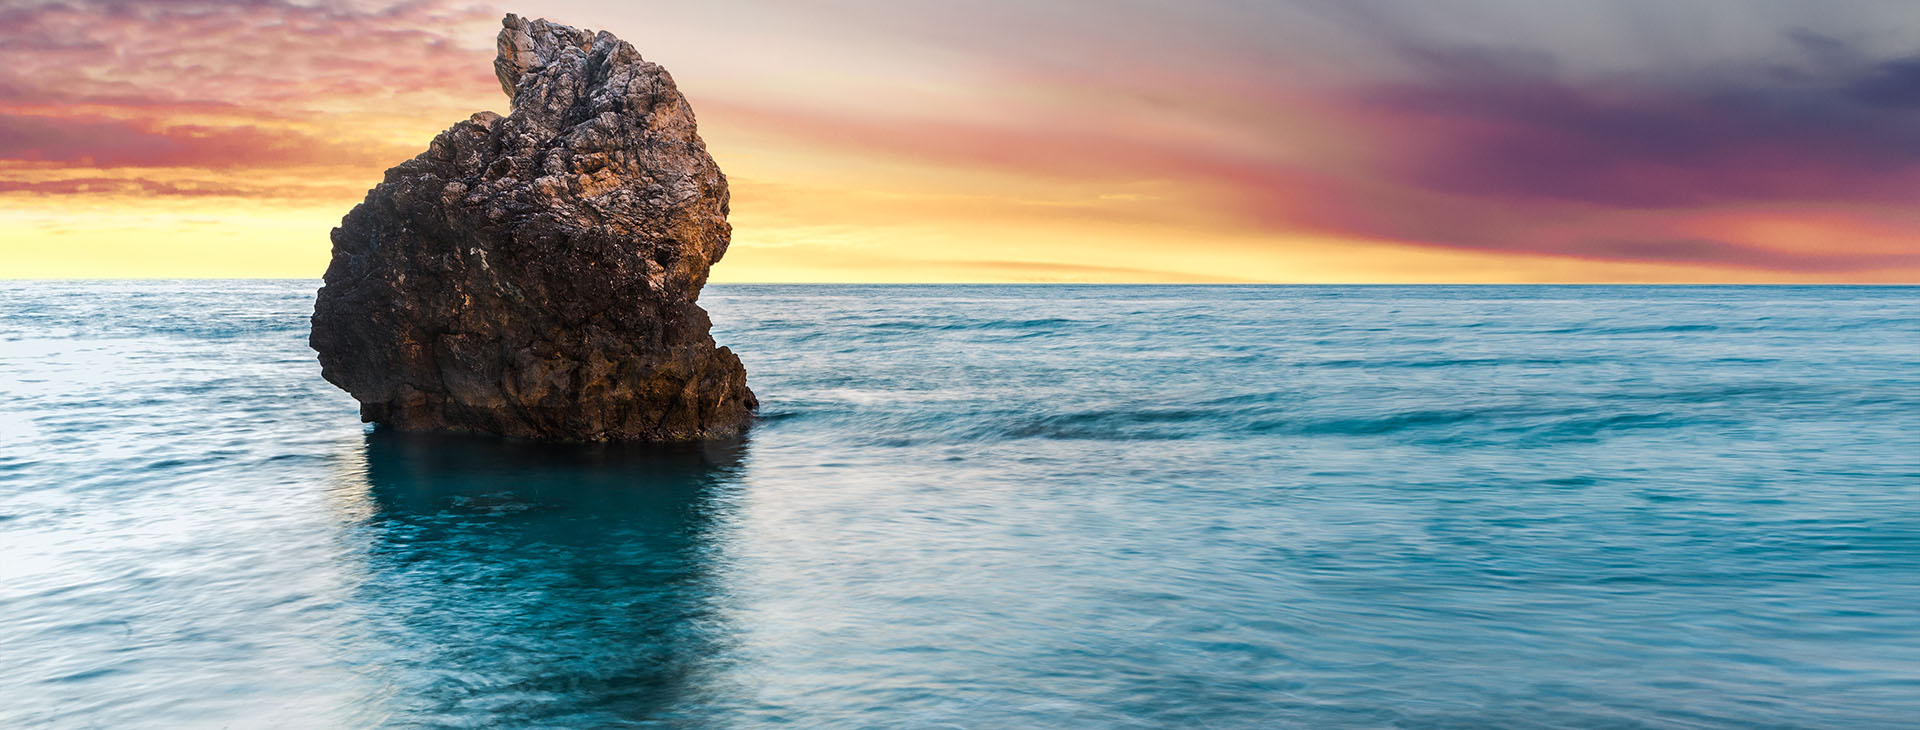 Sunset at Milos beach on Lefkada island